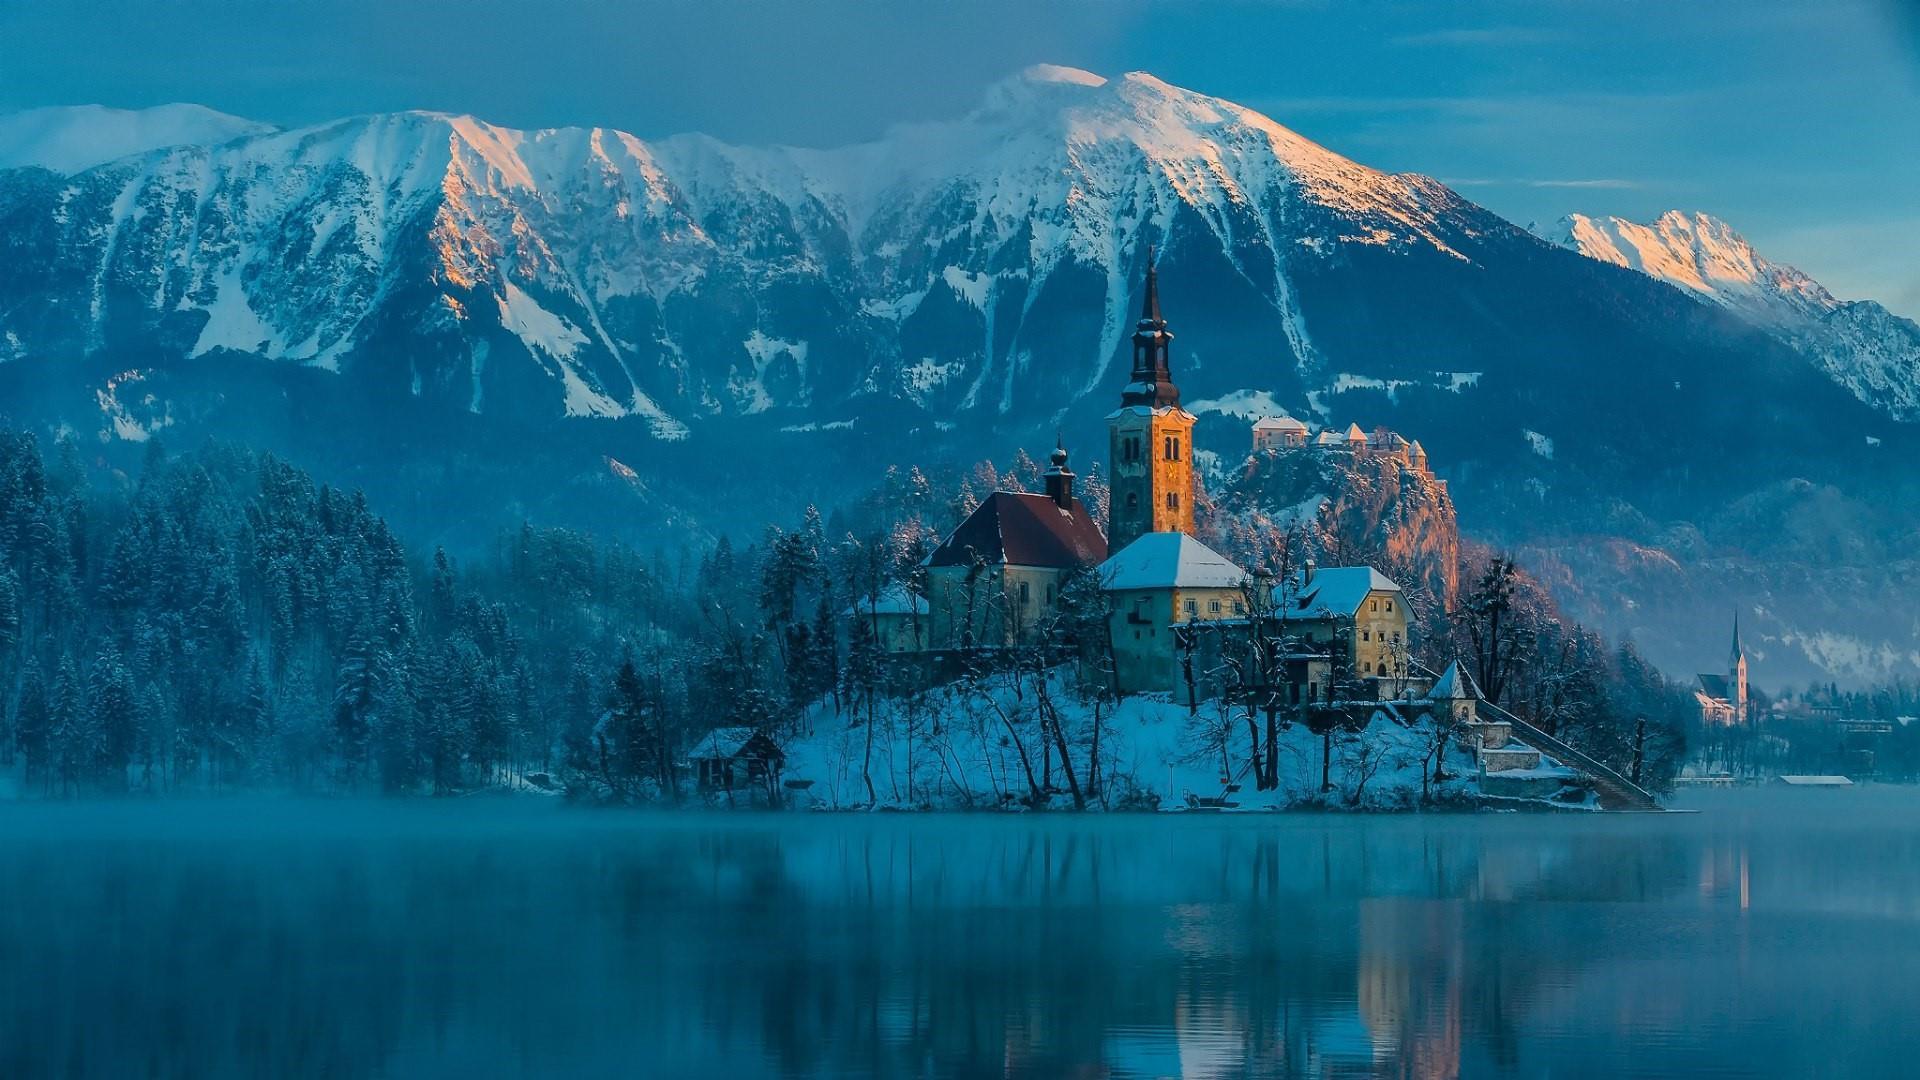 Lake Bled - Slovenia wallpaper